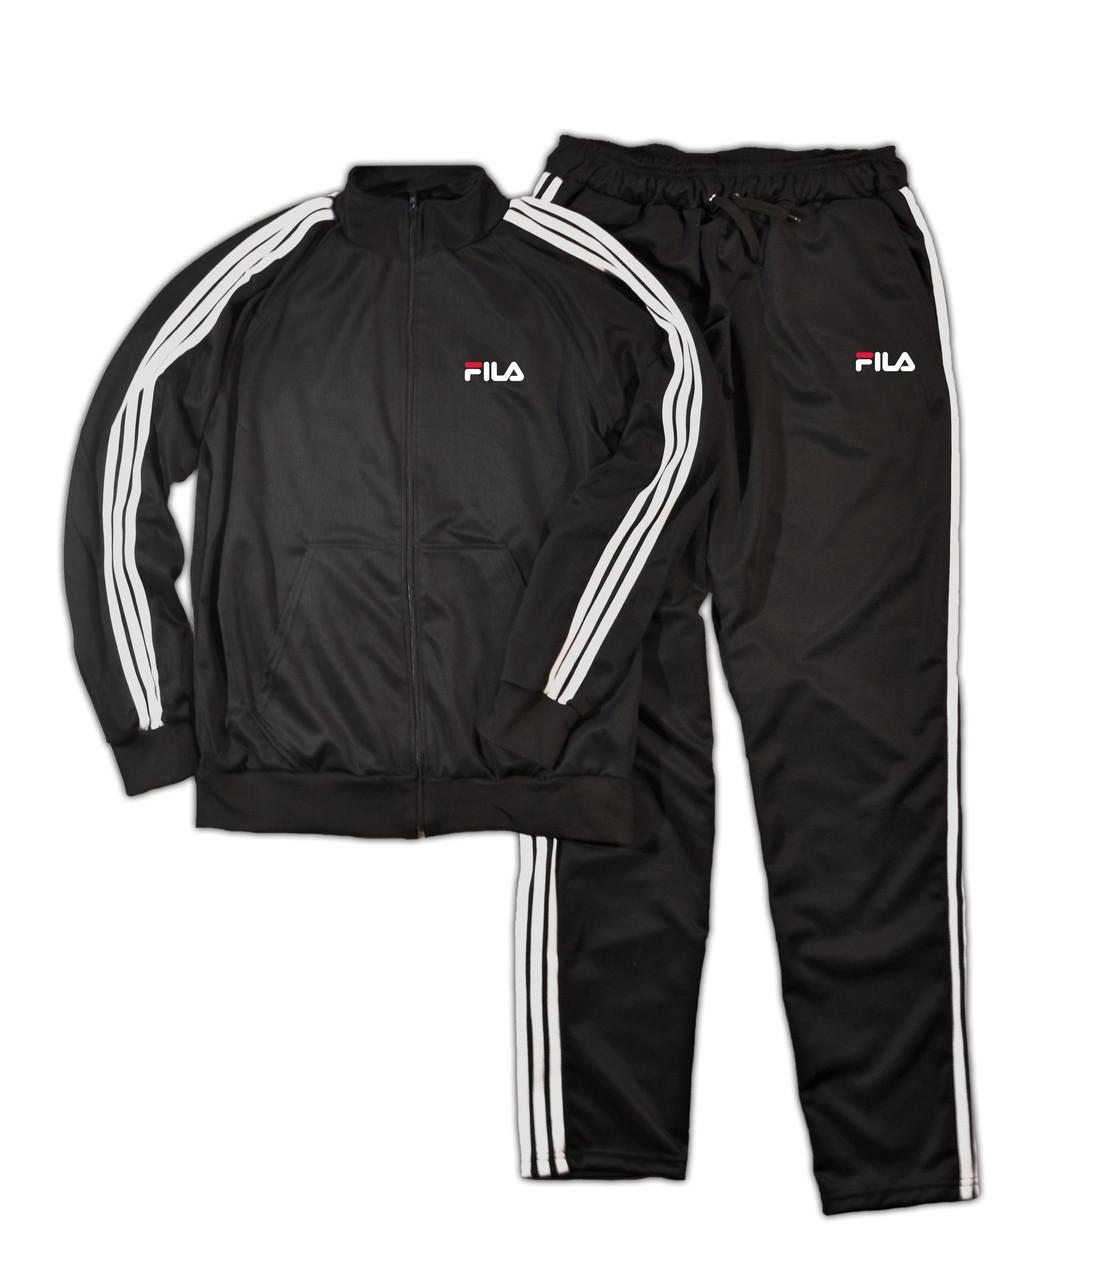 Спортивный костюм Fila (Фила) - Эластика - Спортивный магазин - SPORT-STORE. c3769eceb13fd